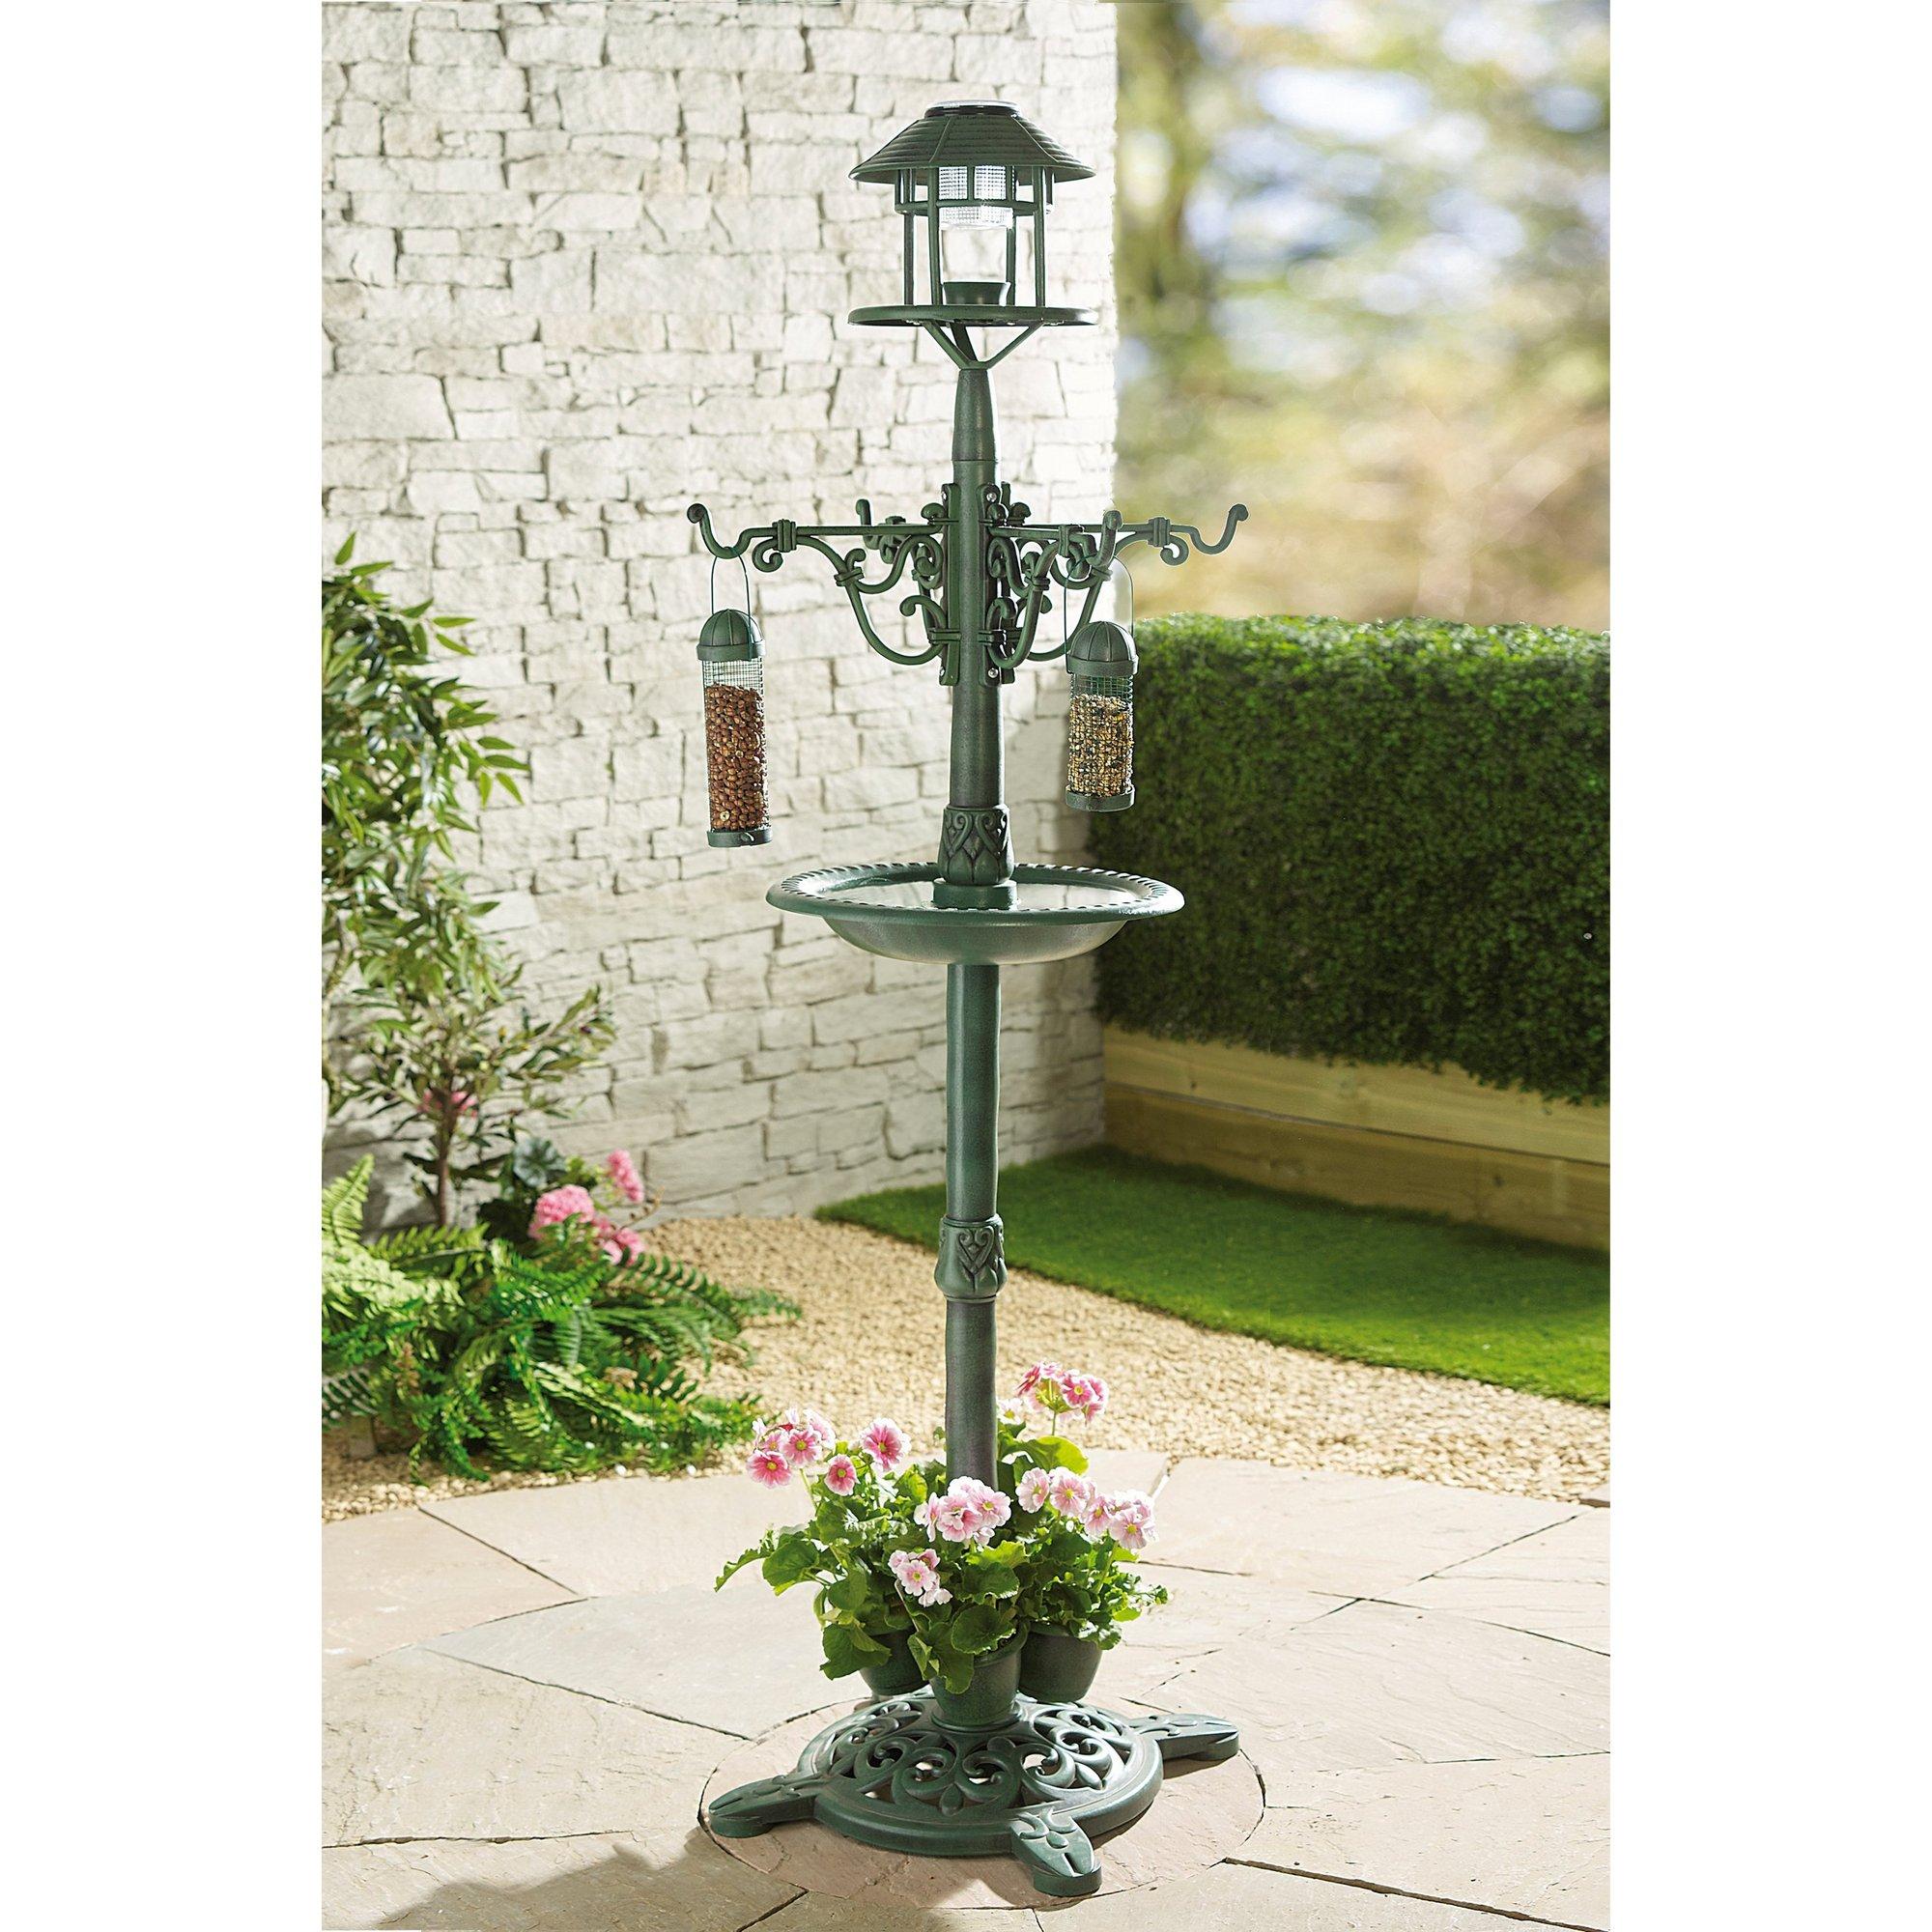 Image of Solar Planter Bird Feeder Lamp Post